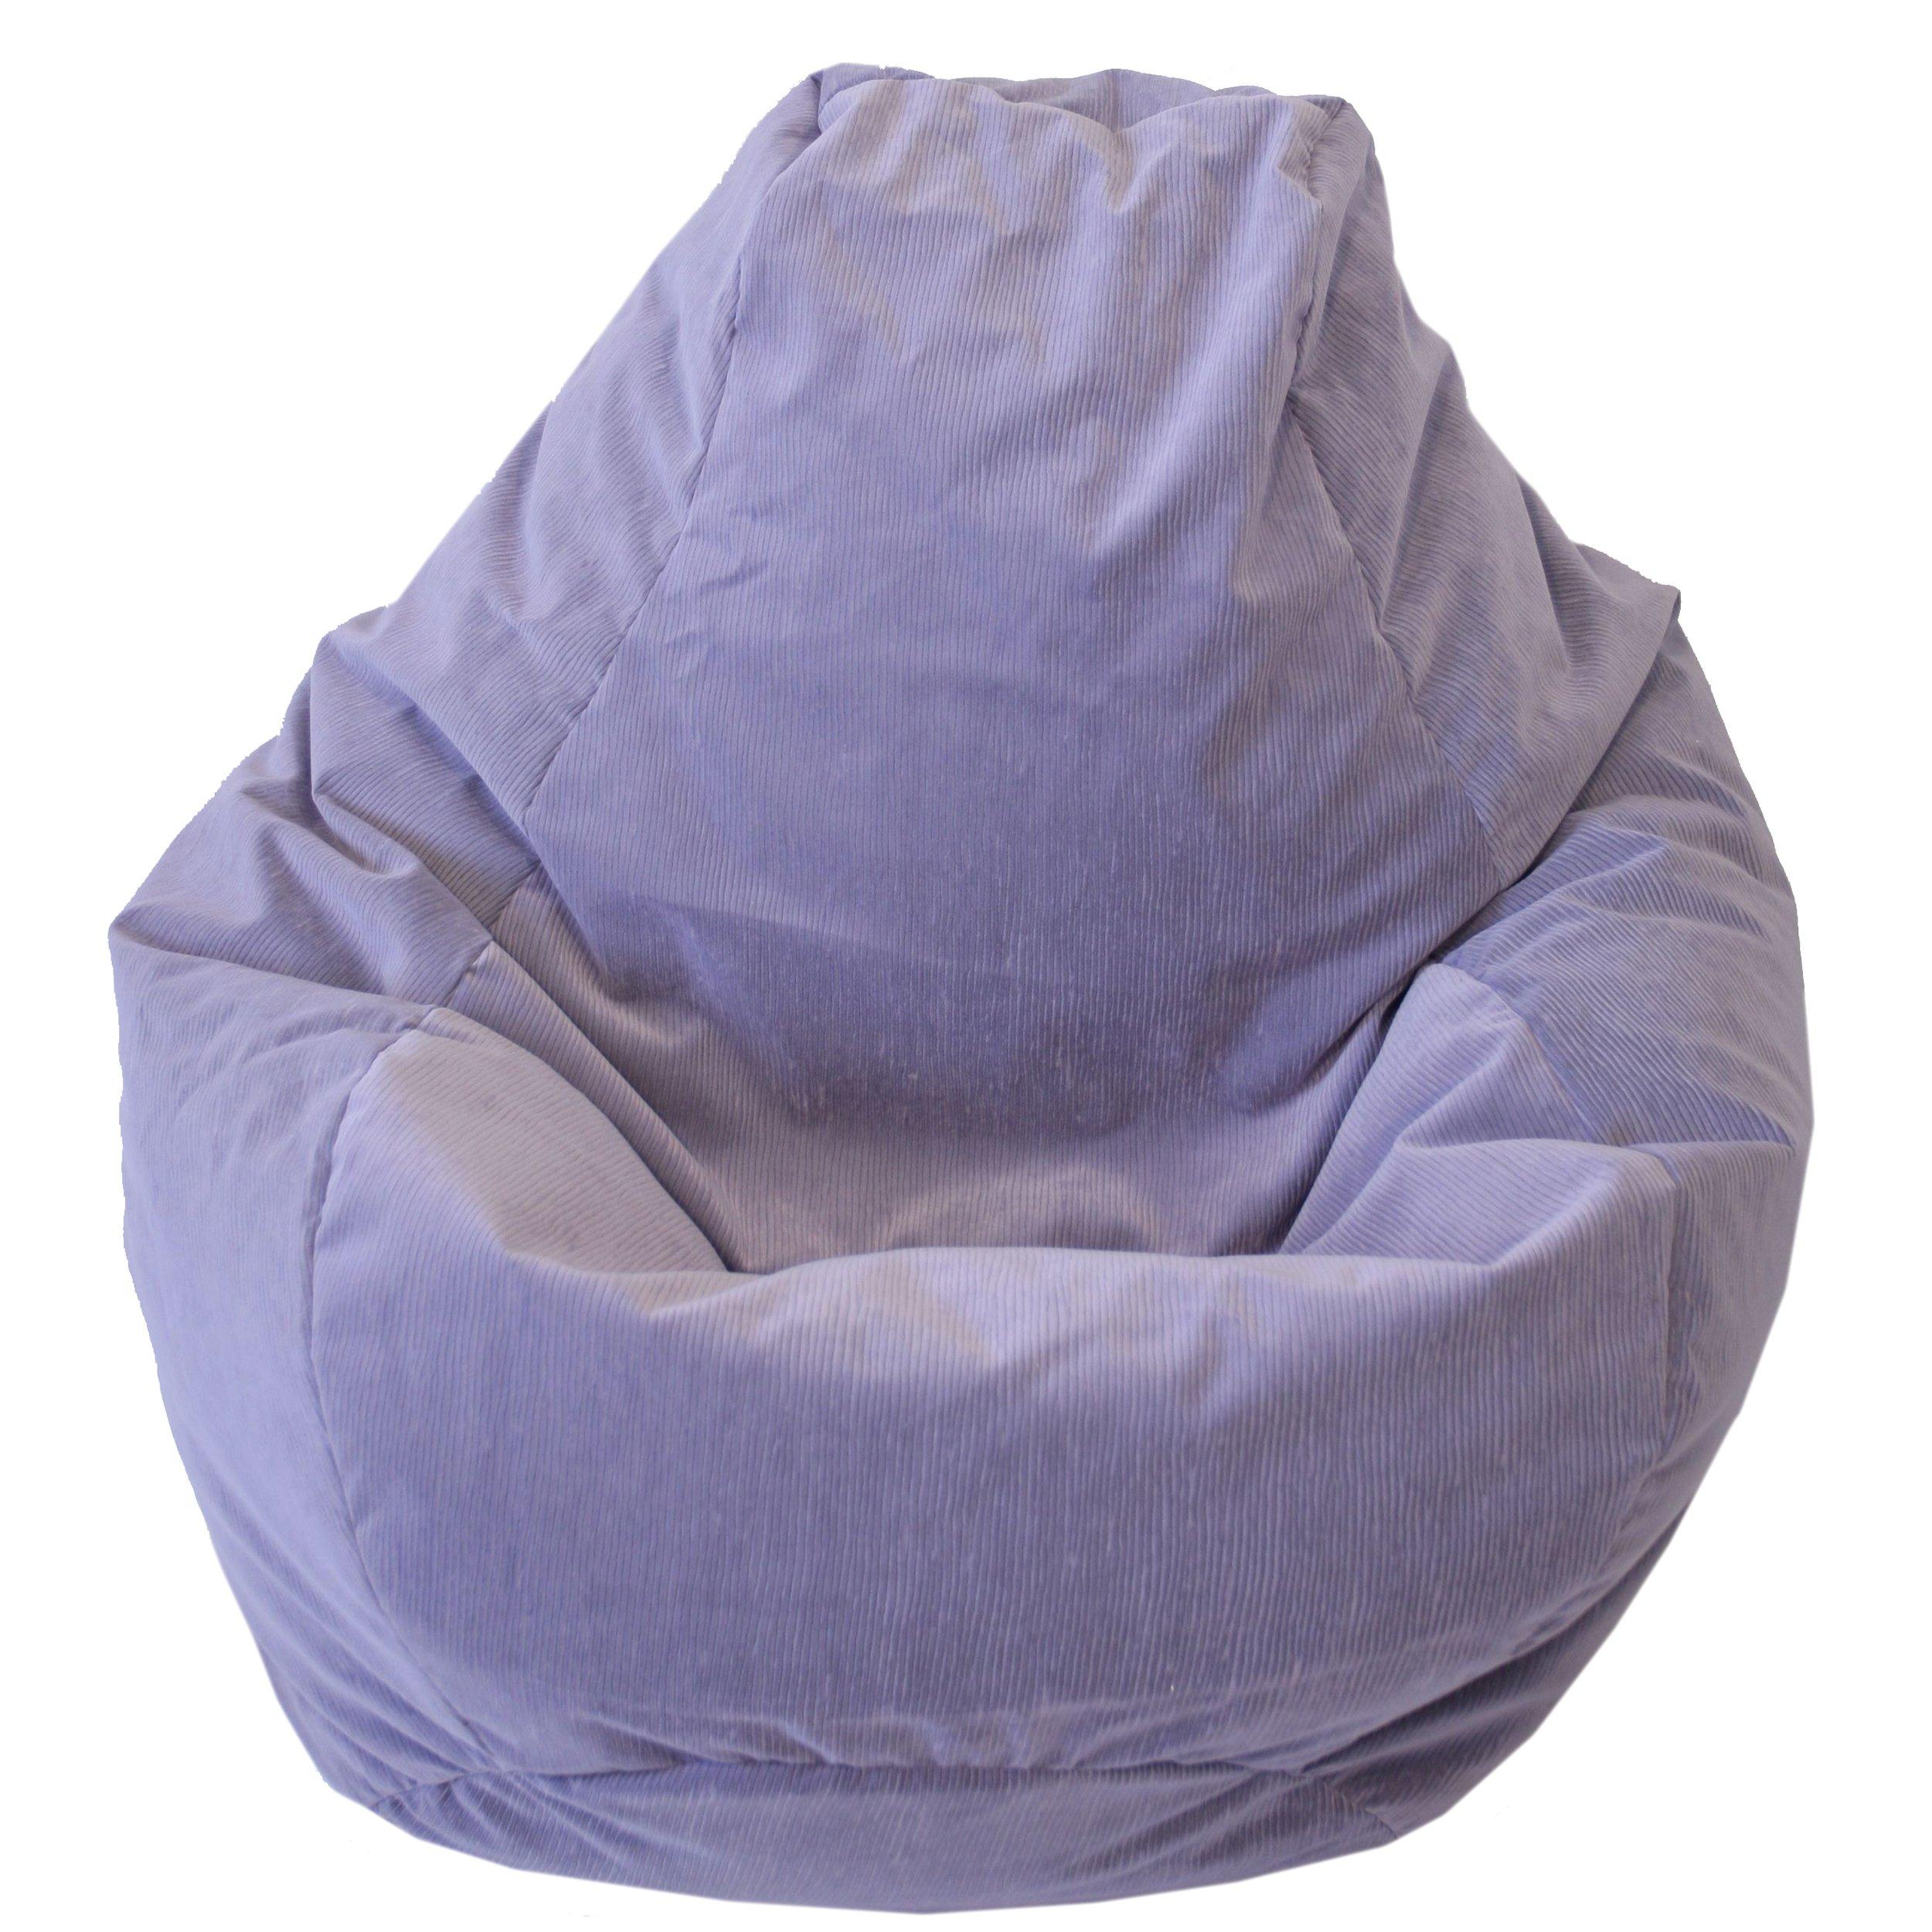 Gold Medal Bean Bags Tear Drop Micro-Fiber Suede Corduroy Bean Bag, Large, Lilac